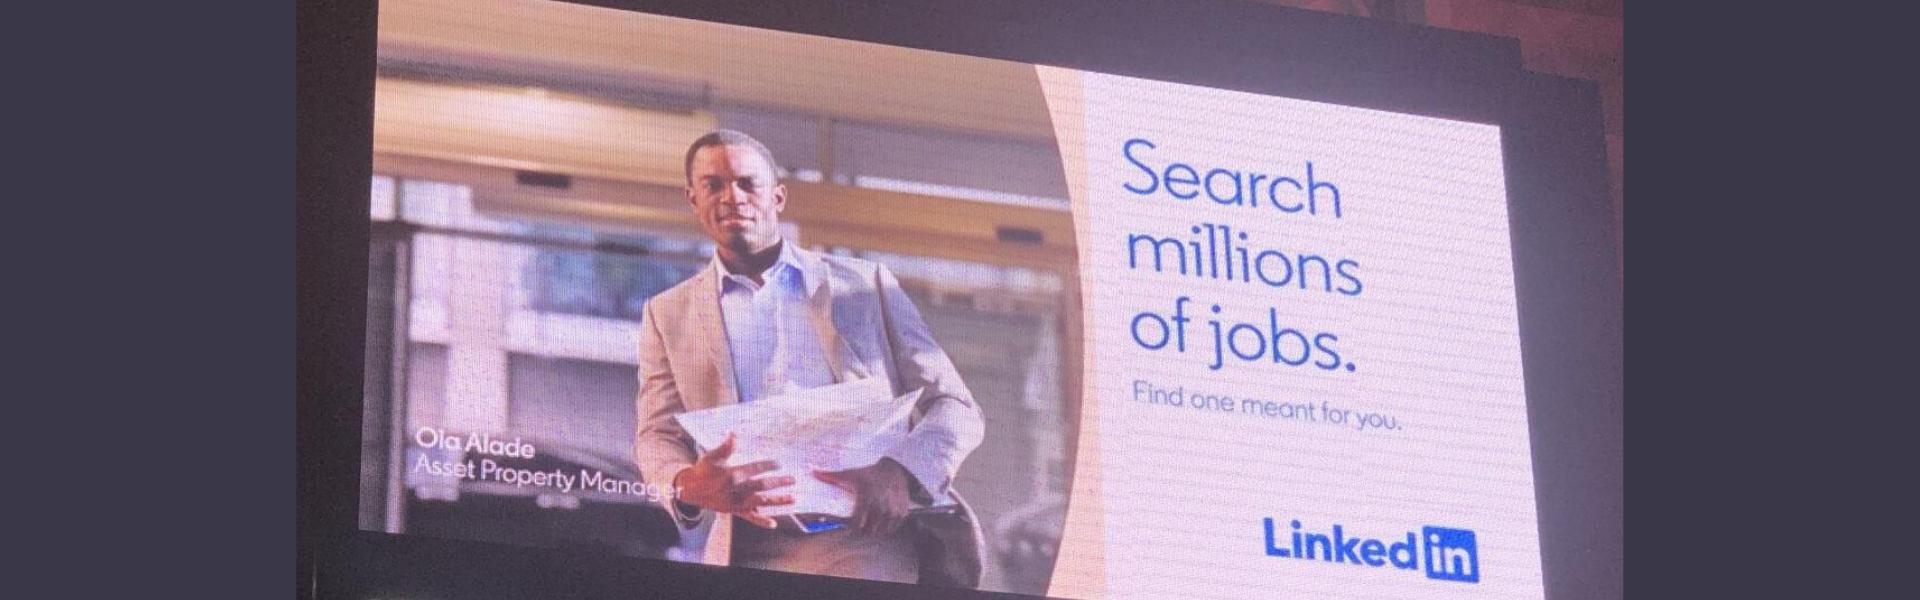 Why do people use LinkedIn, LinkedIn job search billboard